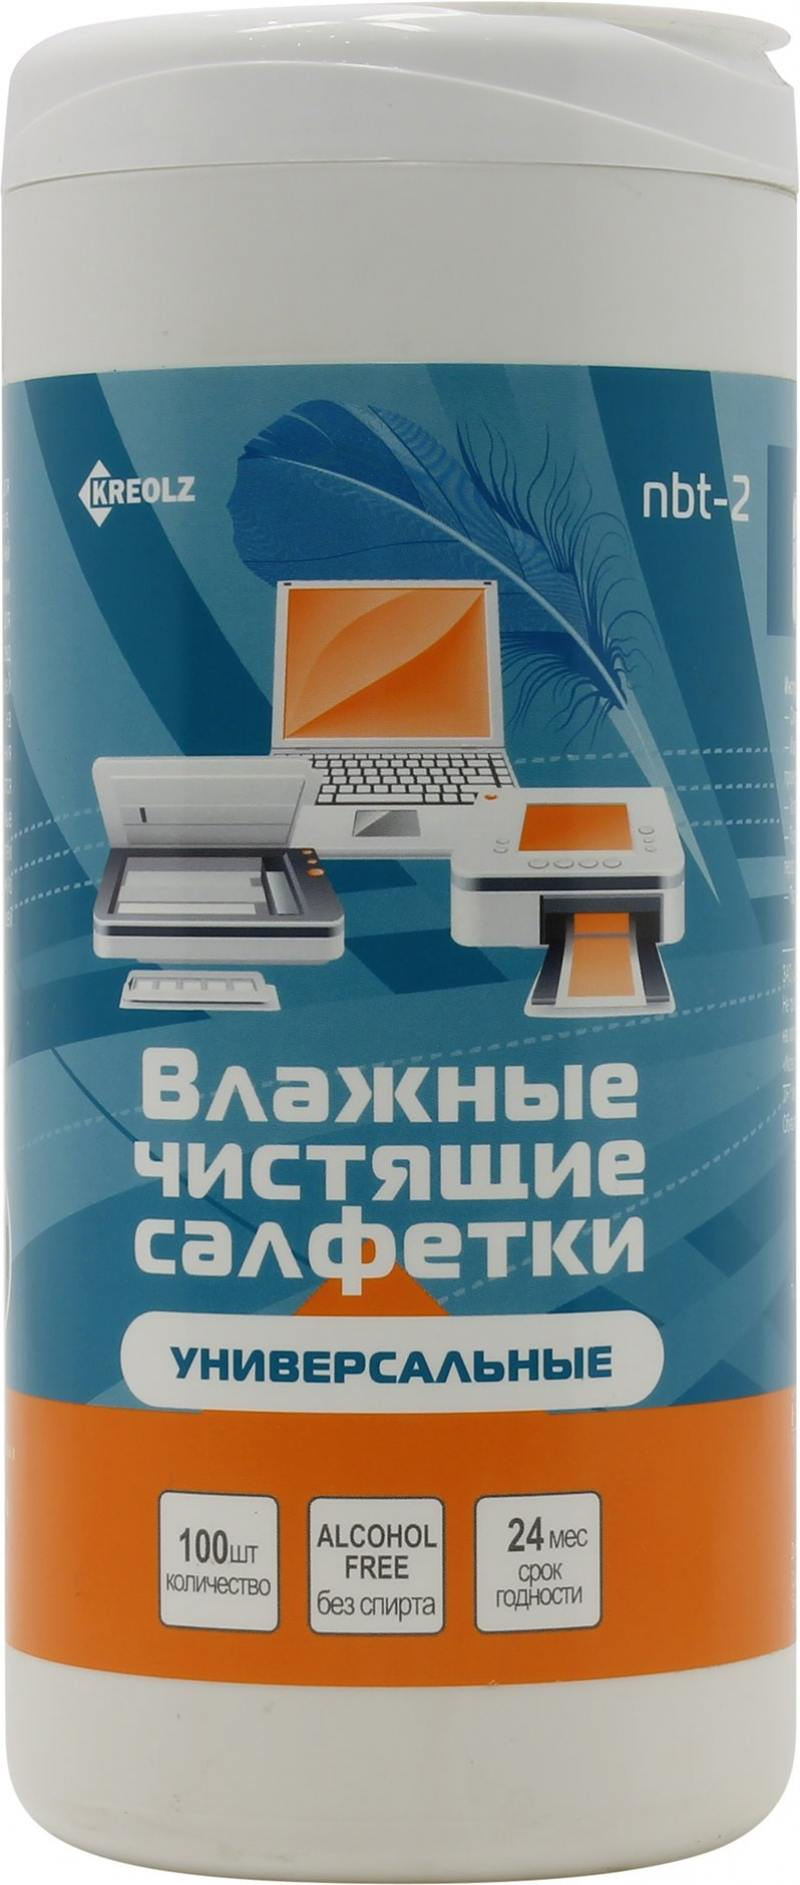 Чистящие салфетки Kreolz NBT-2 100 шт чистящие салфетки silwerhof notebook clean 100 шт 671203